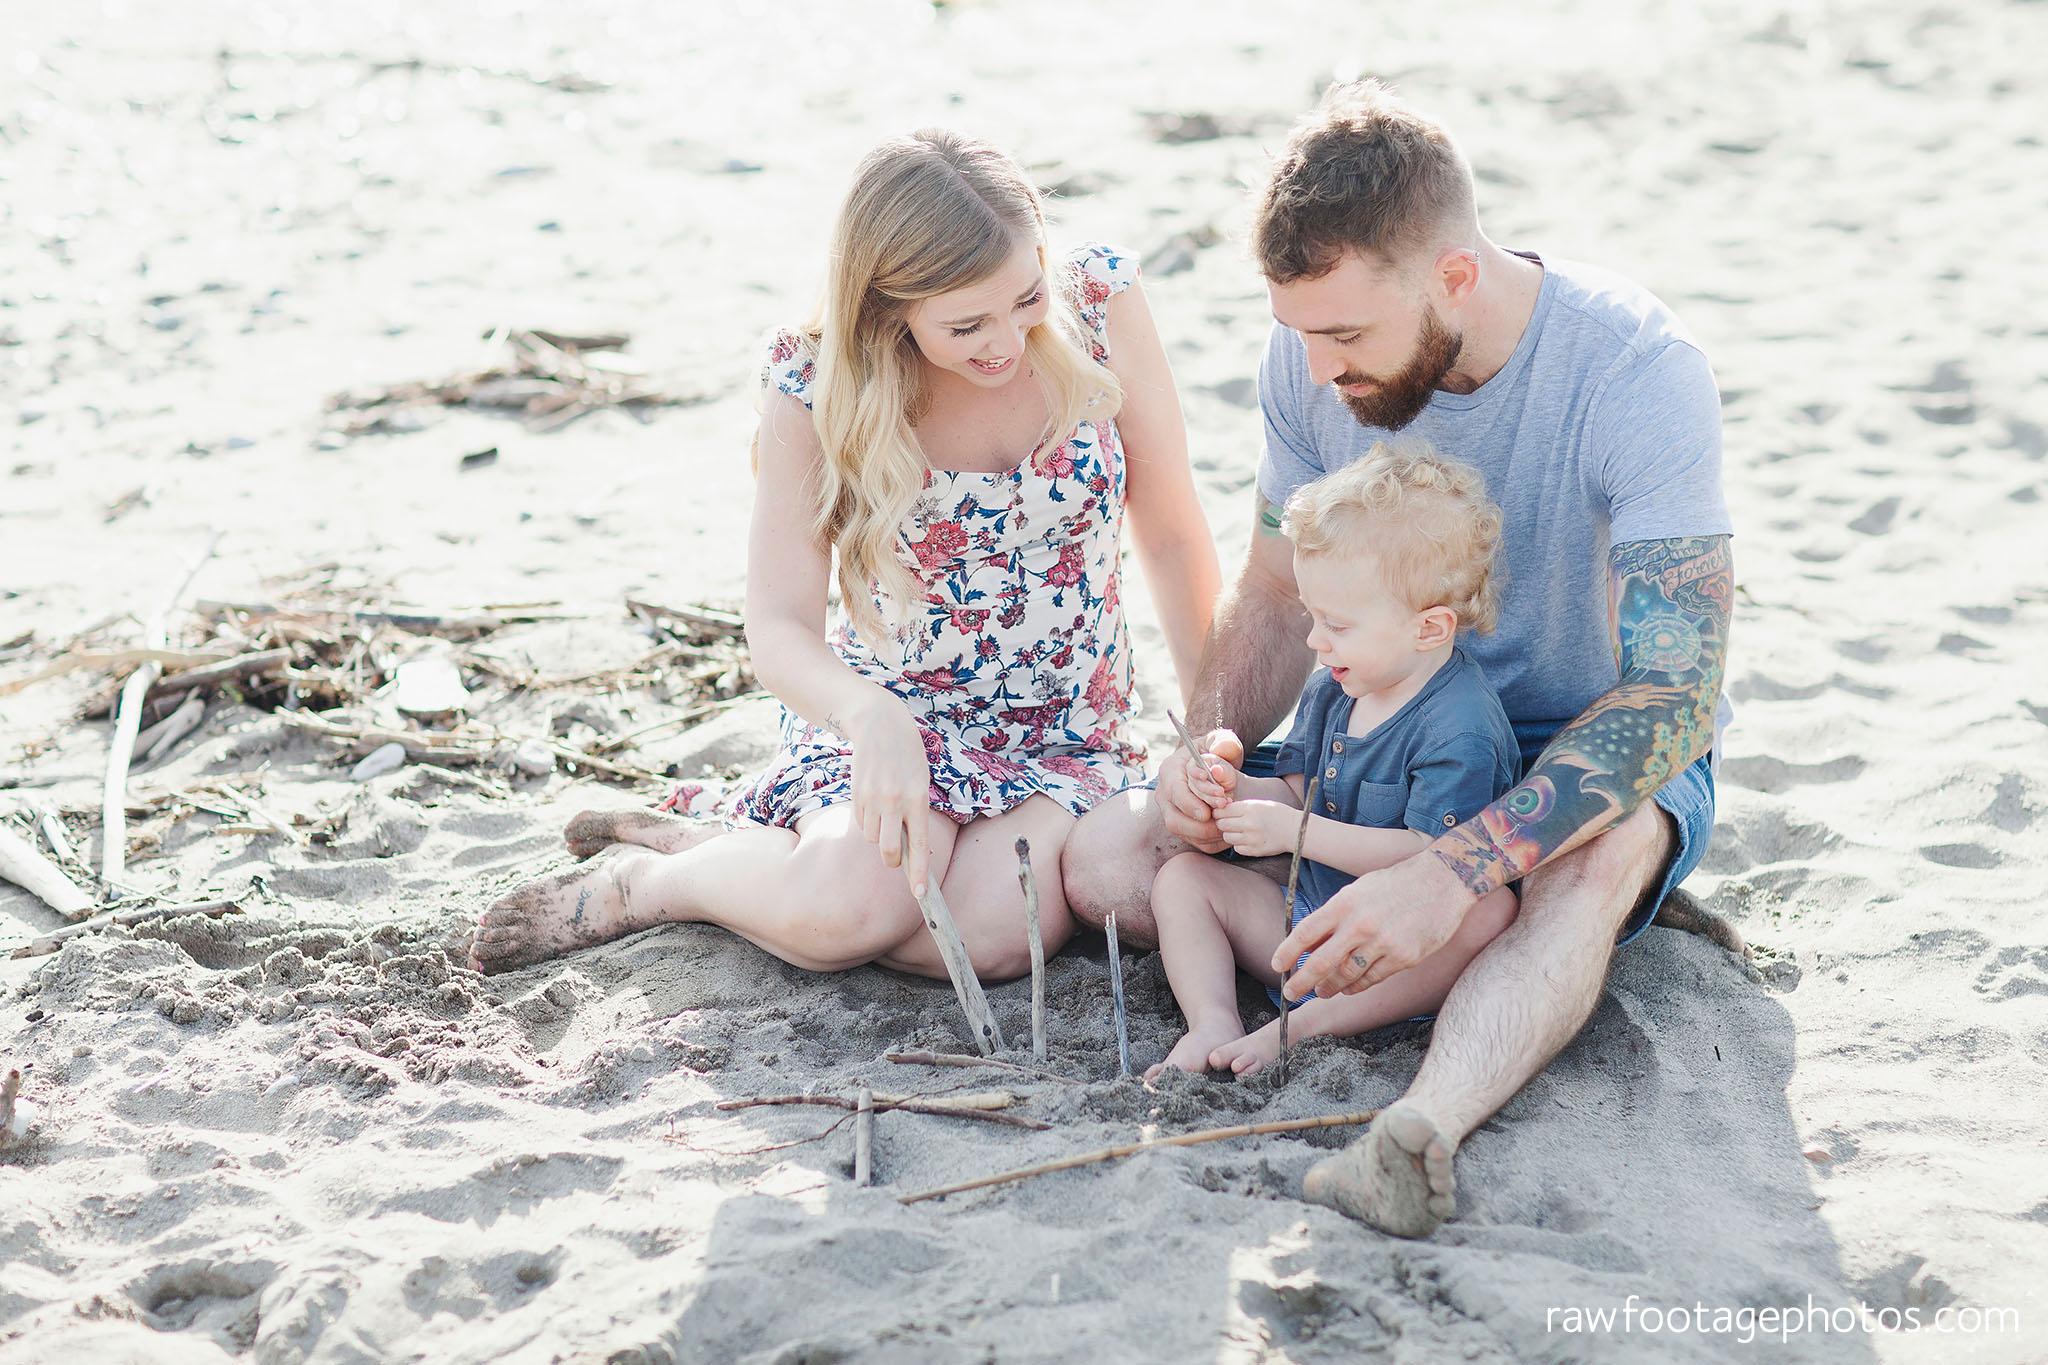 london_ontario_photographer-raw_footage_photography-beach_minis-port_stanley_beach-family_photographer-couple_photographer-lifestyle_photographer051.jpg